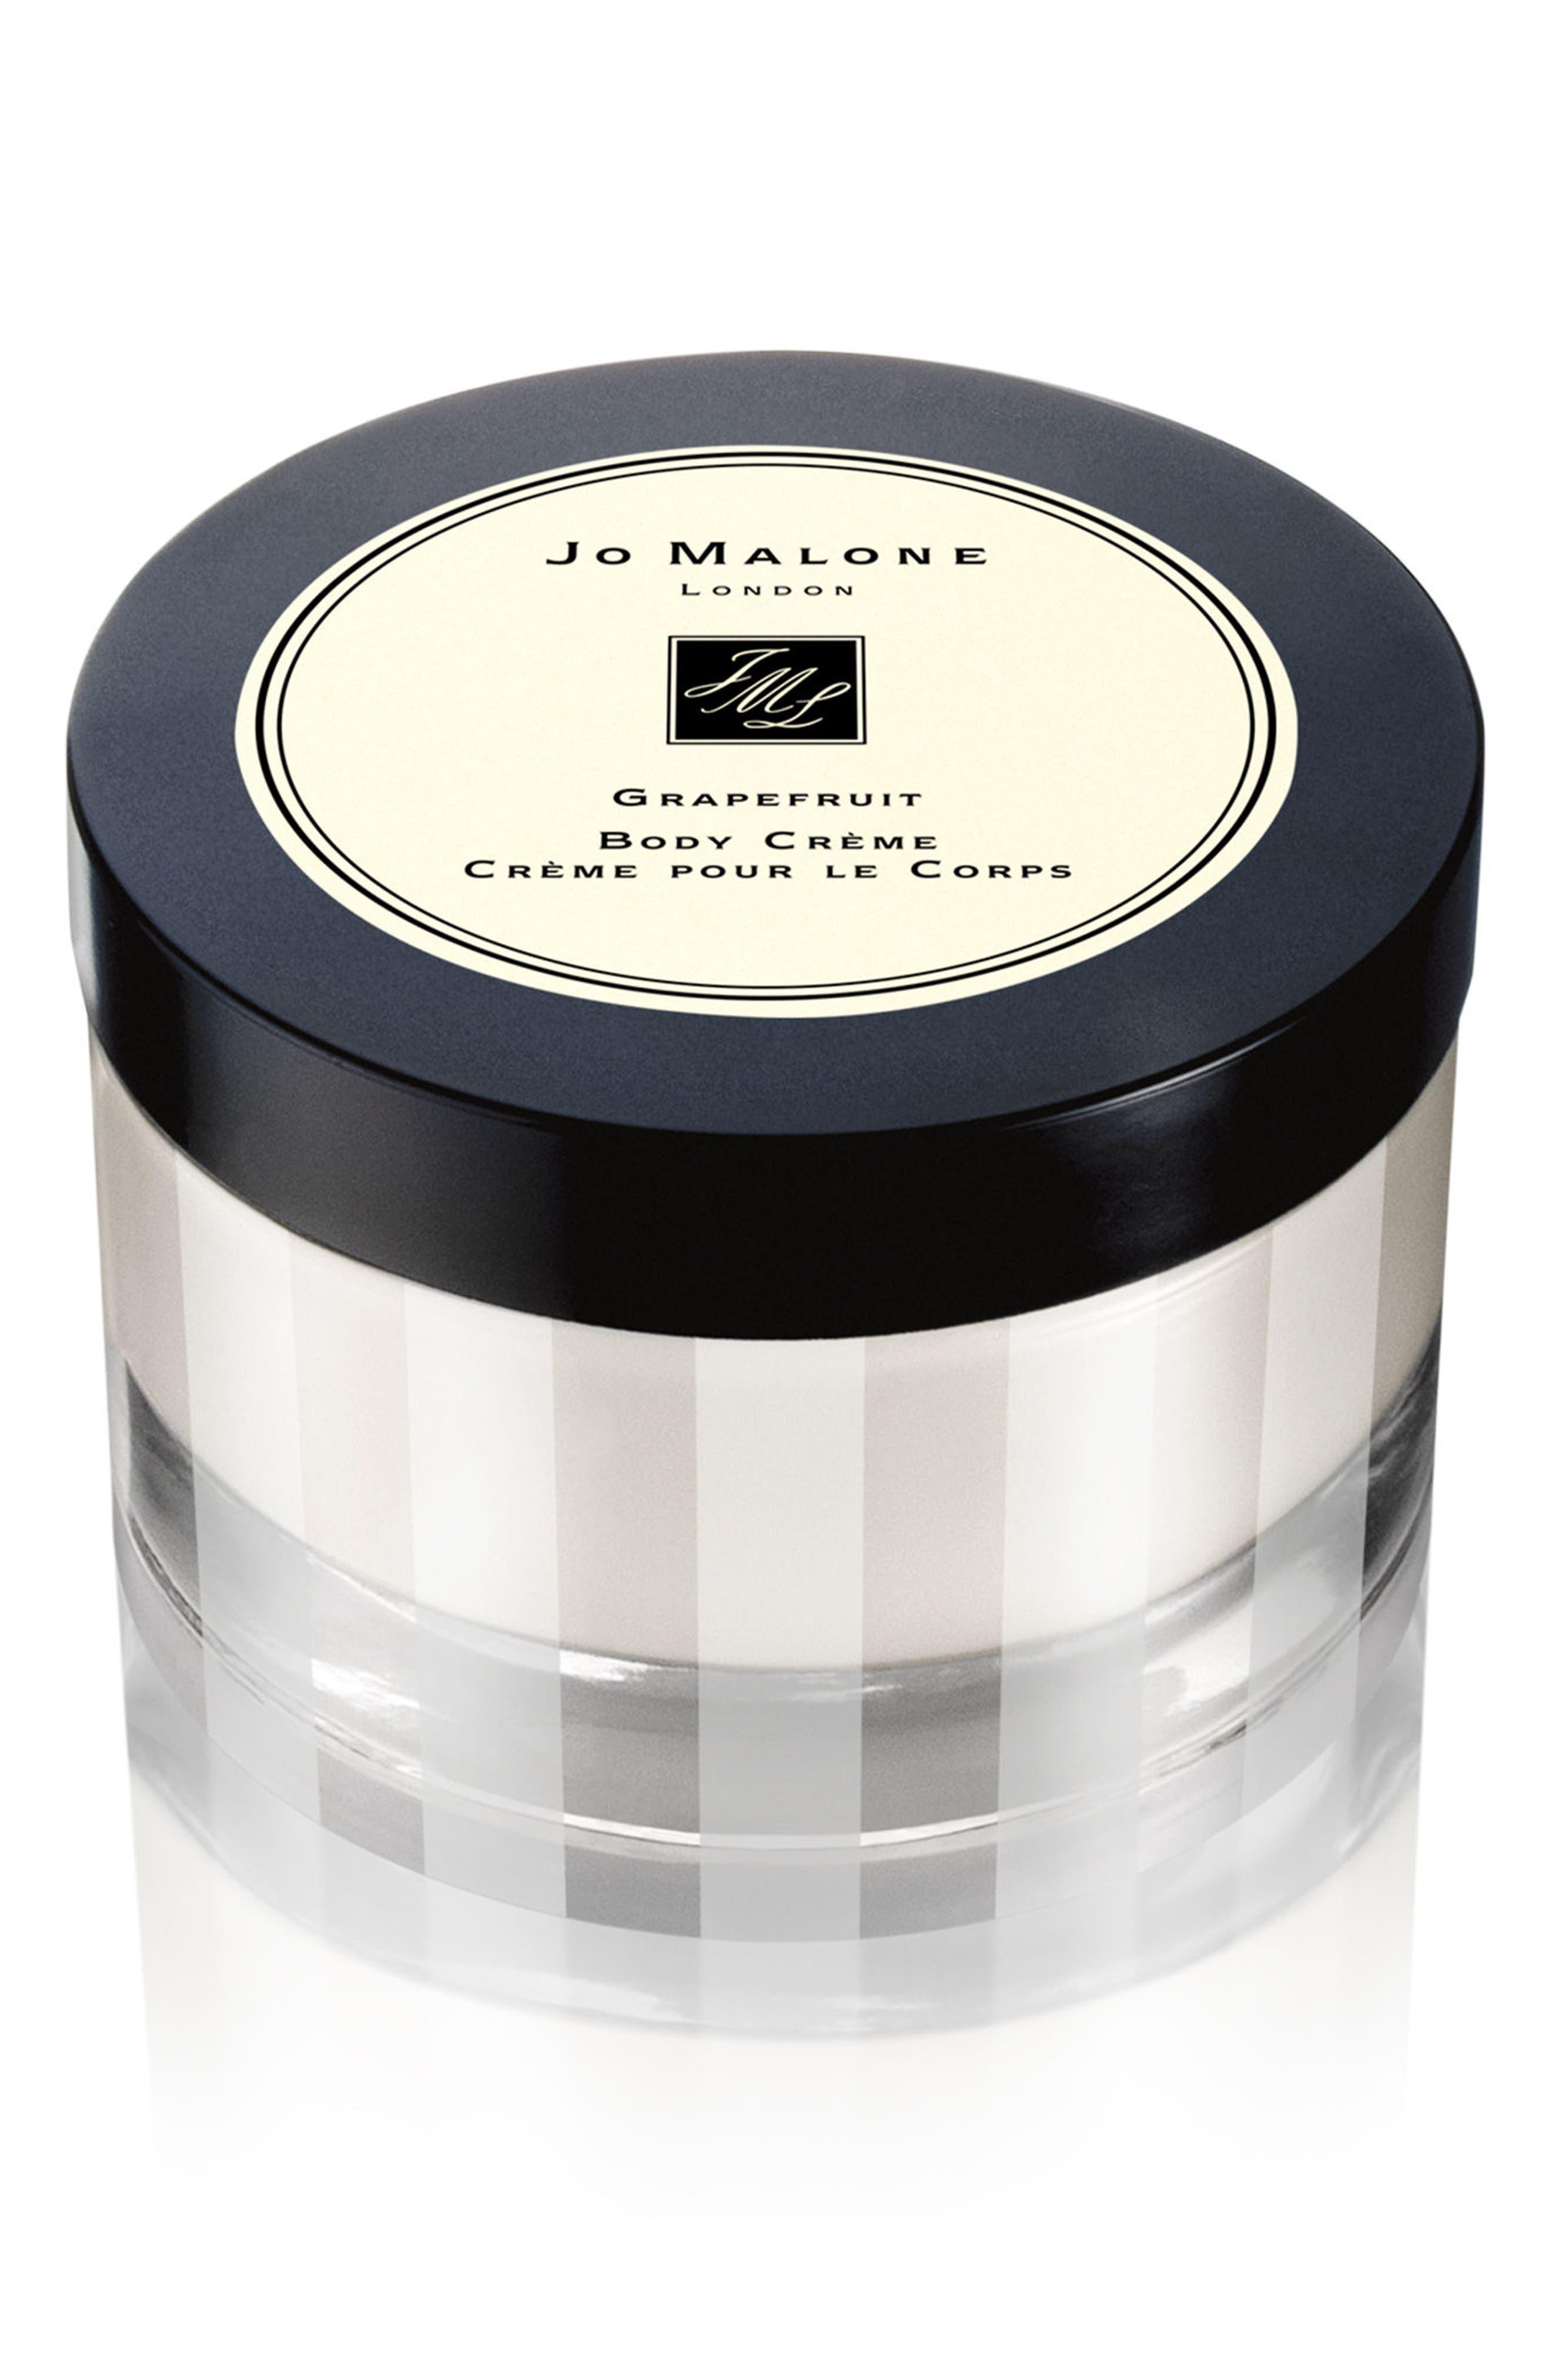 Jo Malone London™ 'Grapefruit' Body Crème